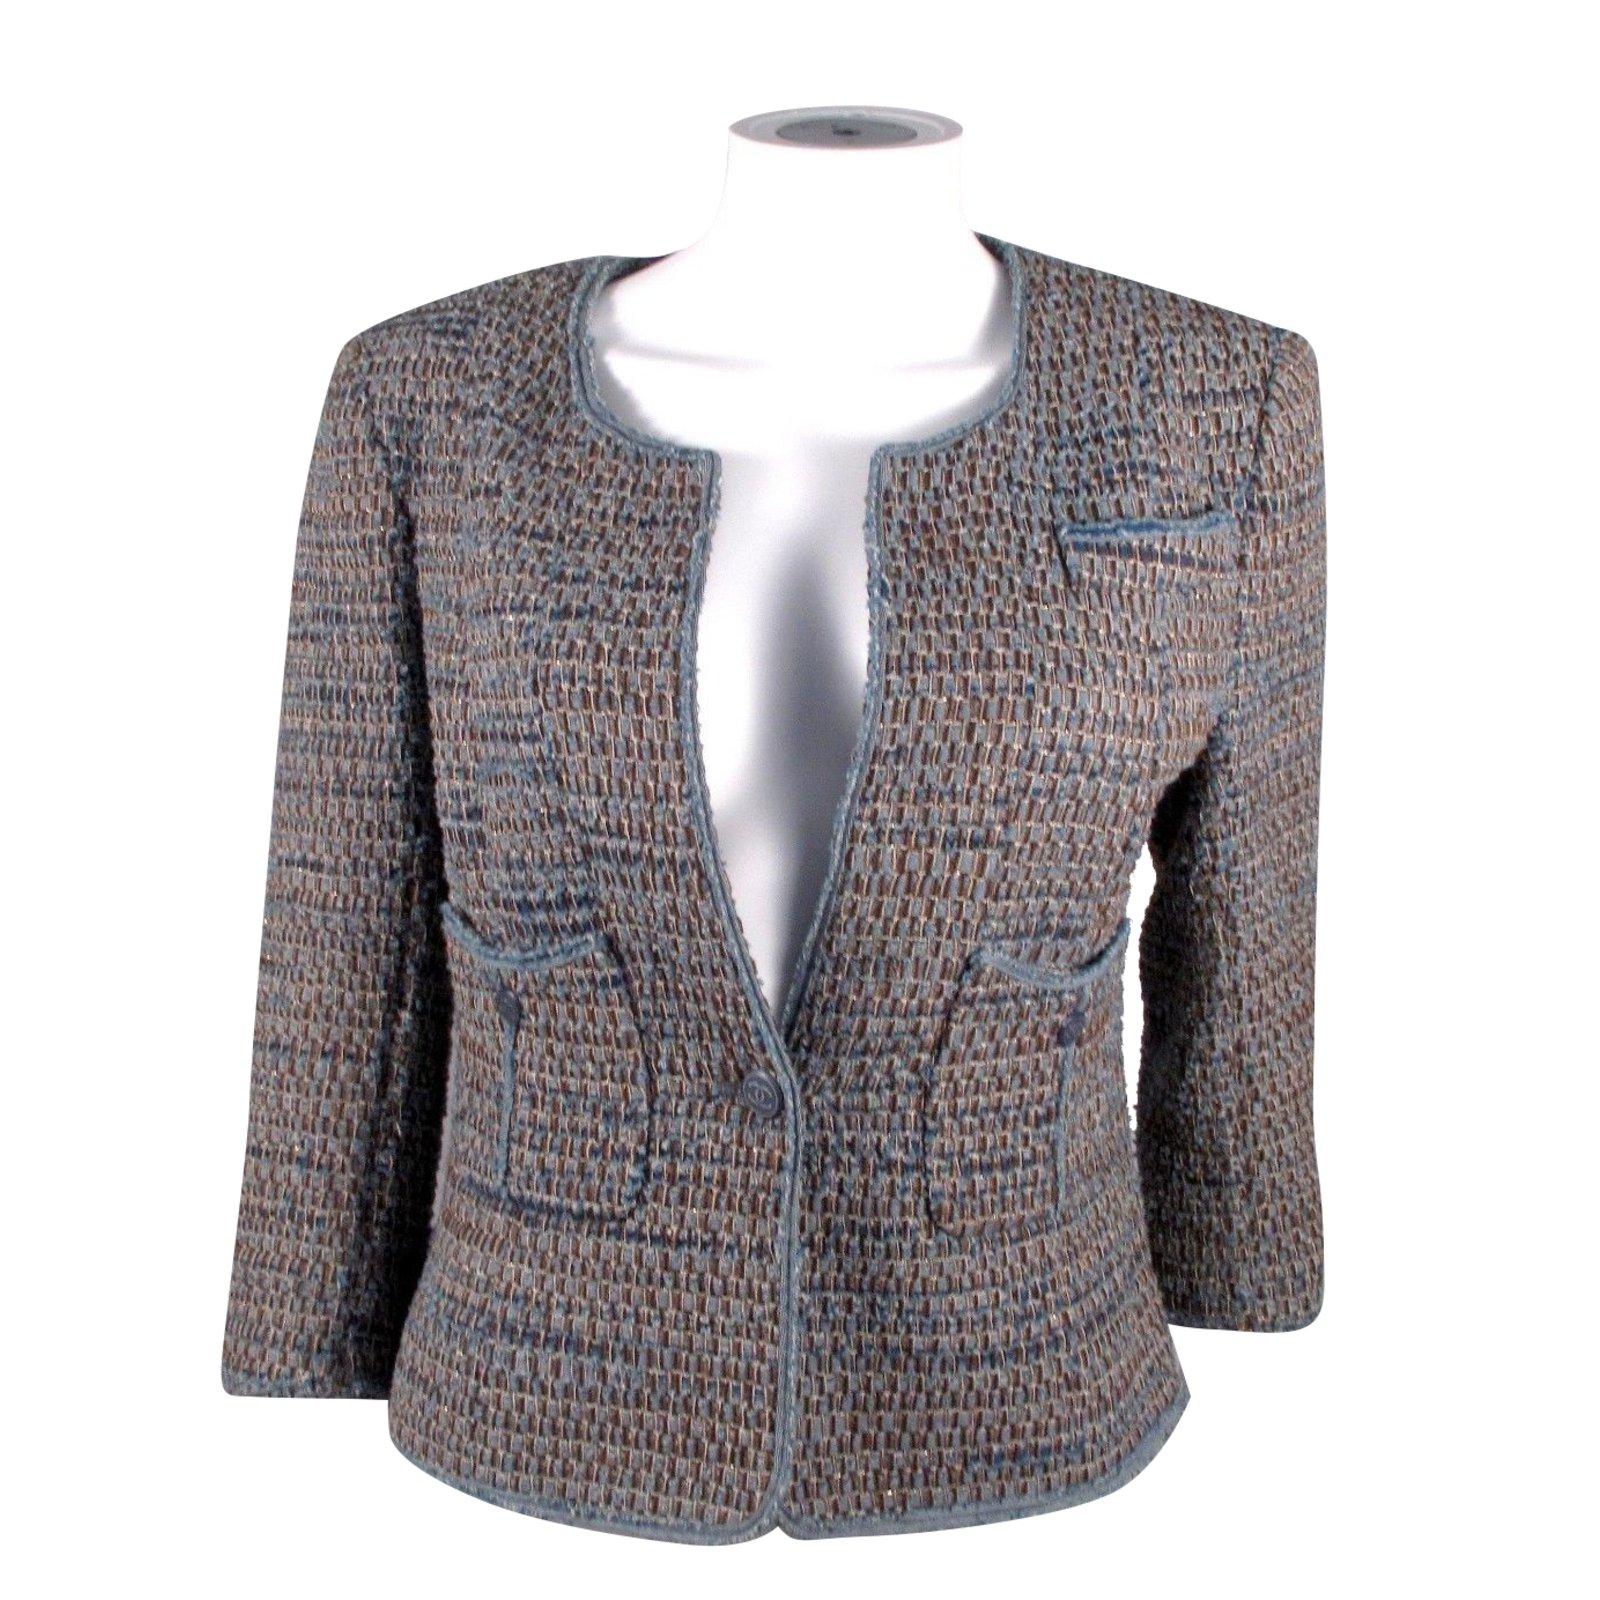 chanel tweed jacket. chanel denim tweed jacket jackets cotton blue ref.37150 .